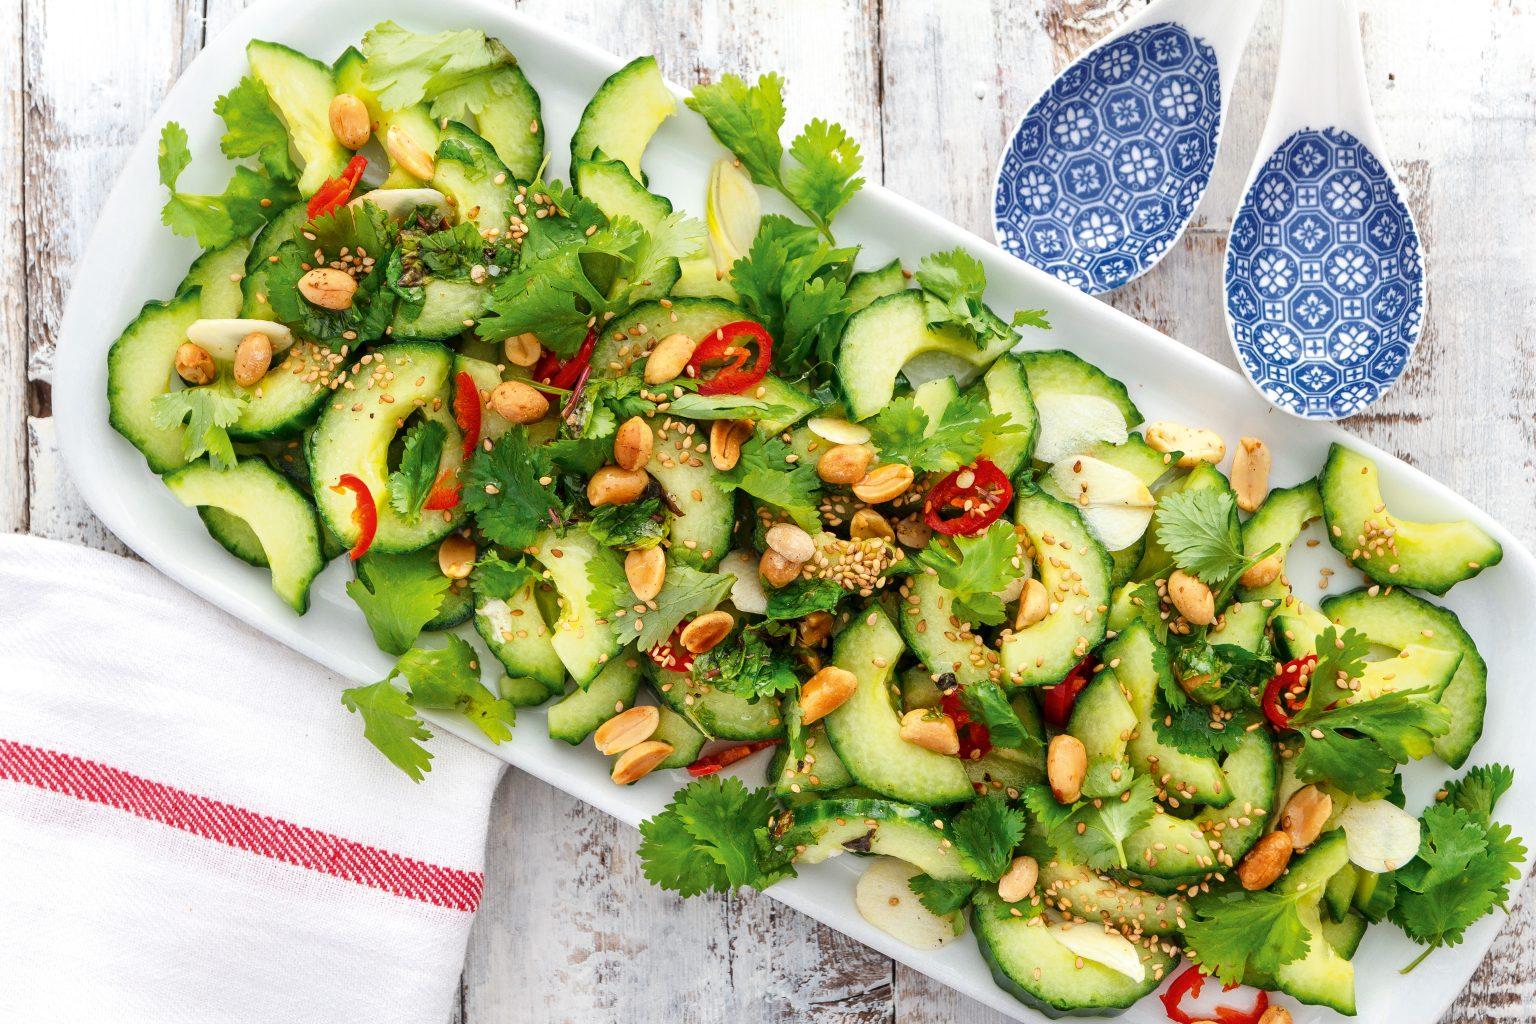 Vegan Vietnamese Cucumber Salad with Cilantro and Roasted Peanuts